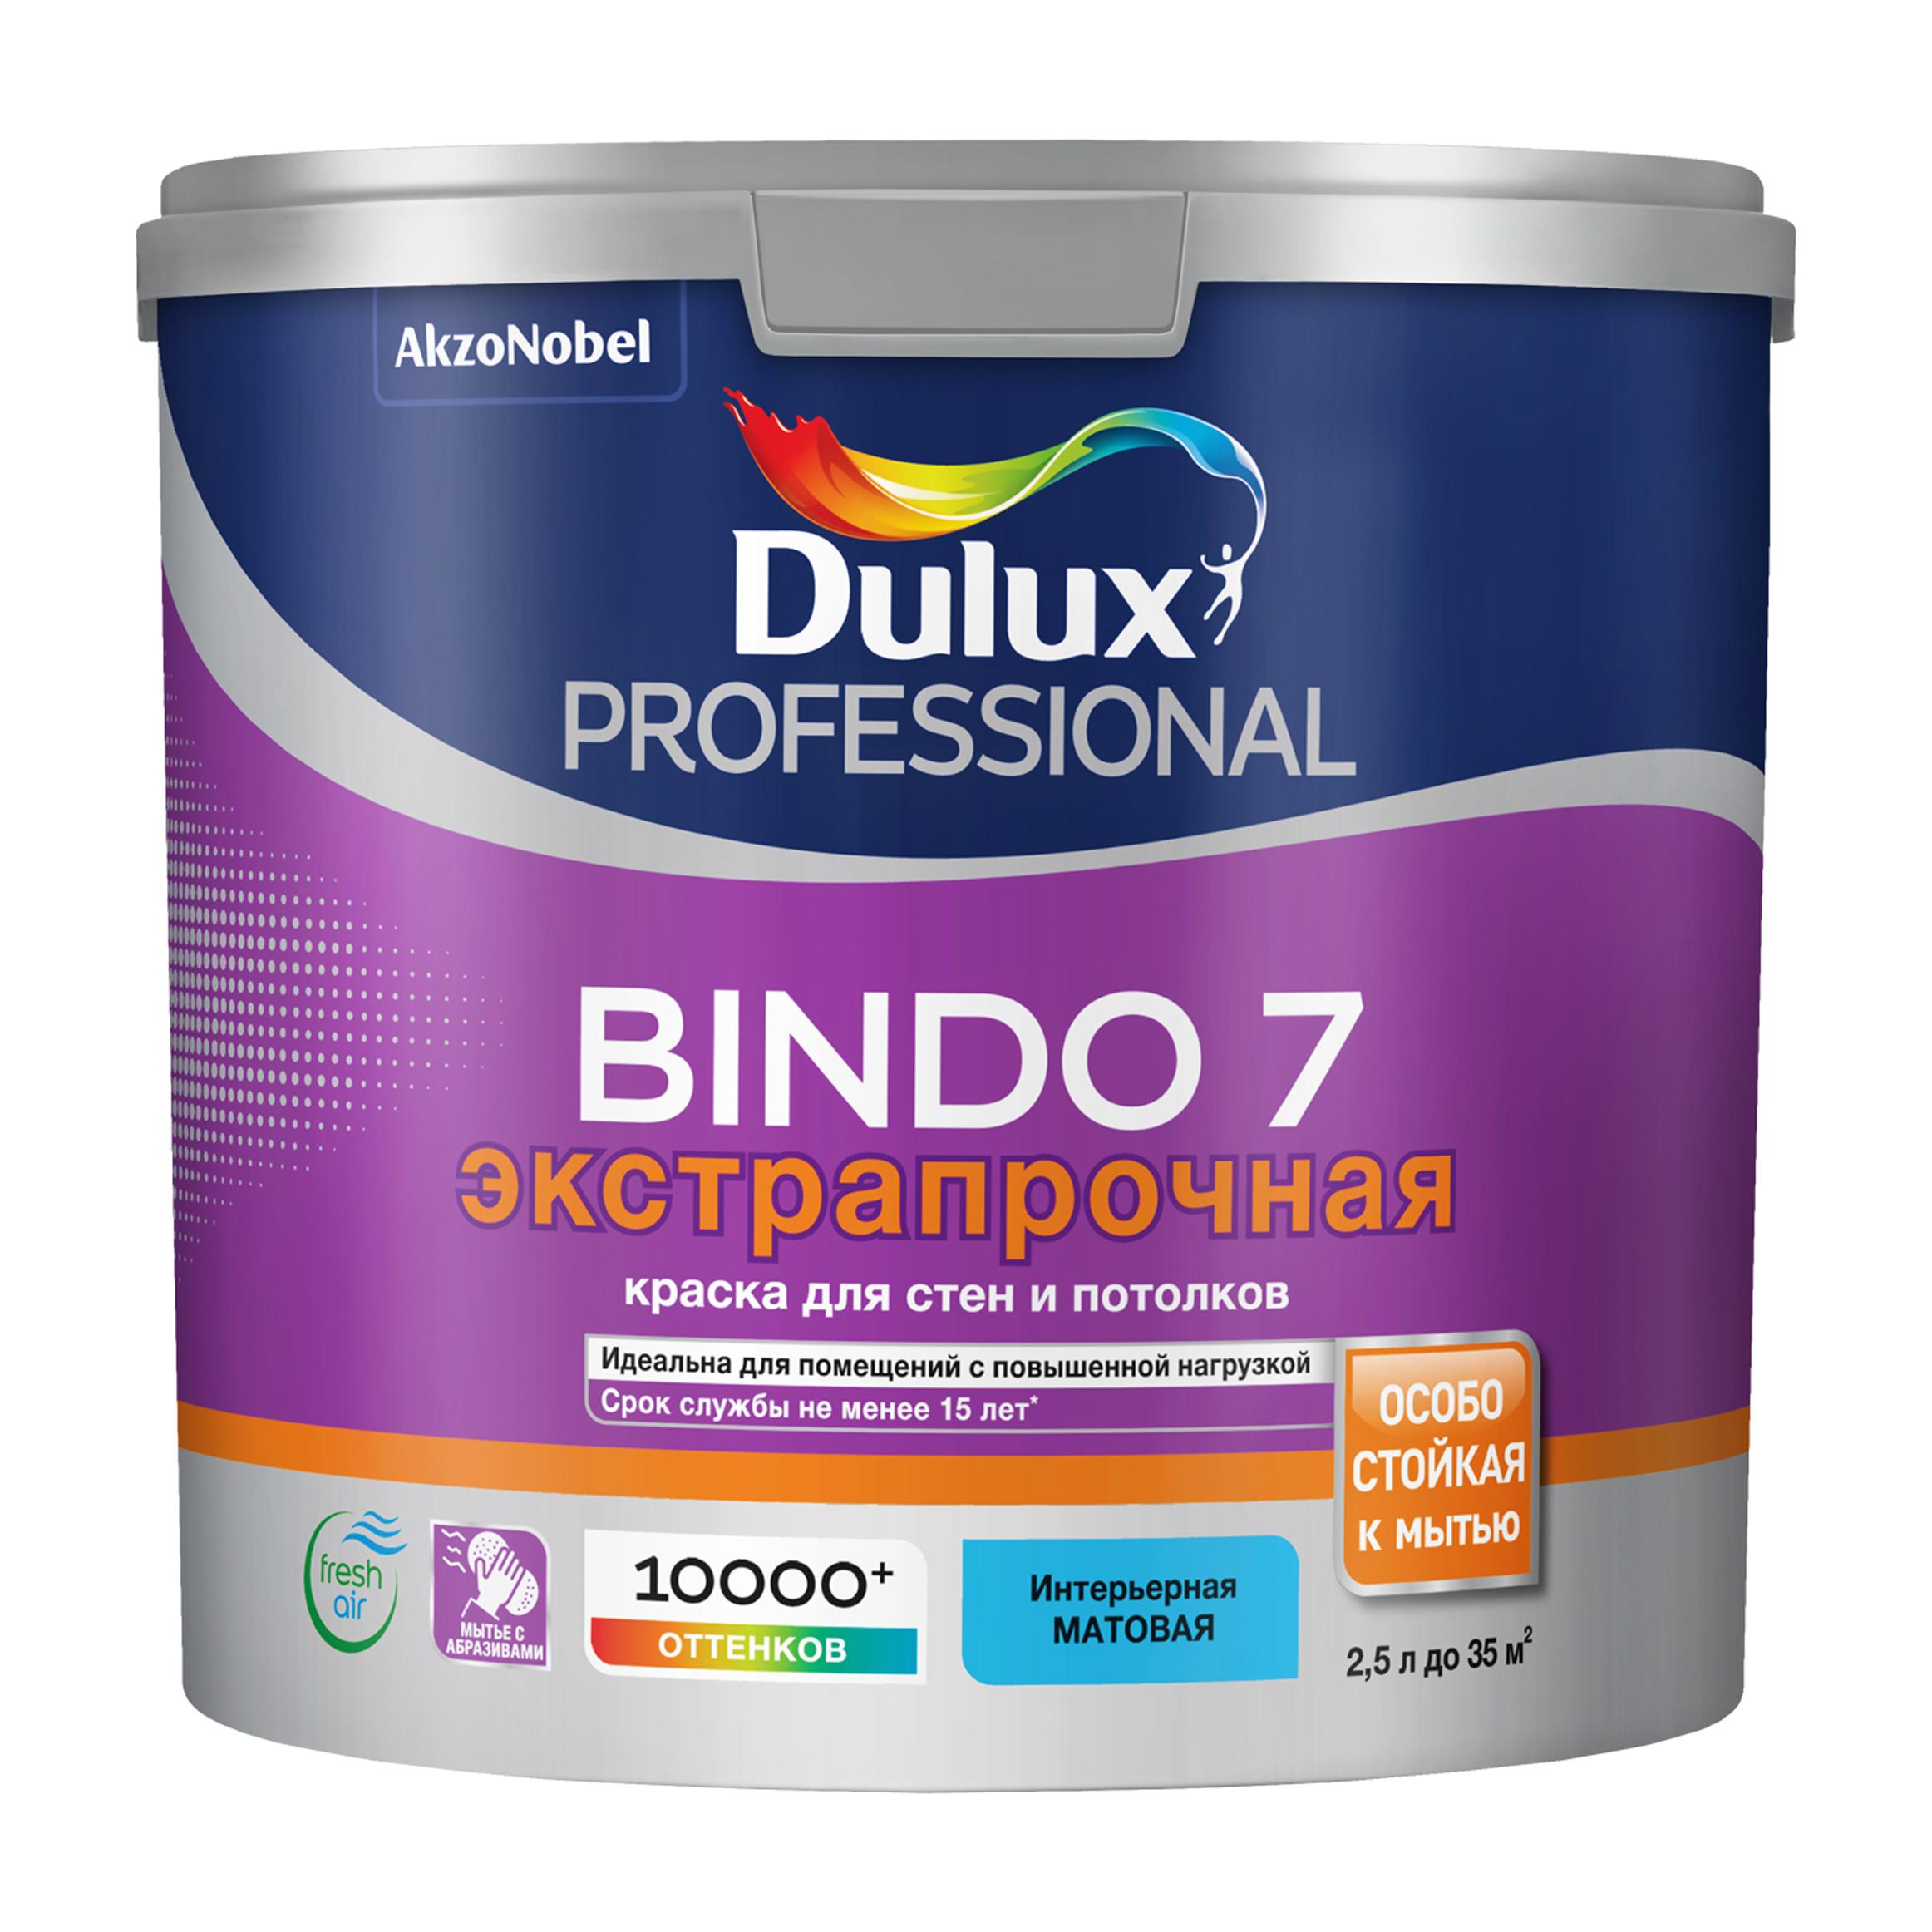 Фото - Краска для стен и потолков латексная экстрапрочная Dulux Professional Bindo 7 матовая база BC 2,25 л. краска водно дисперсионная dulux bindo 7 экстрапрочная моющаяся основа вс 1 л